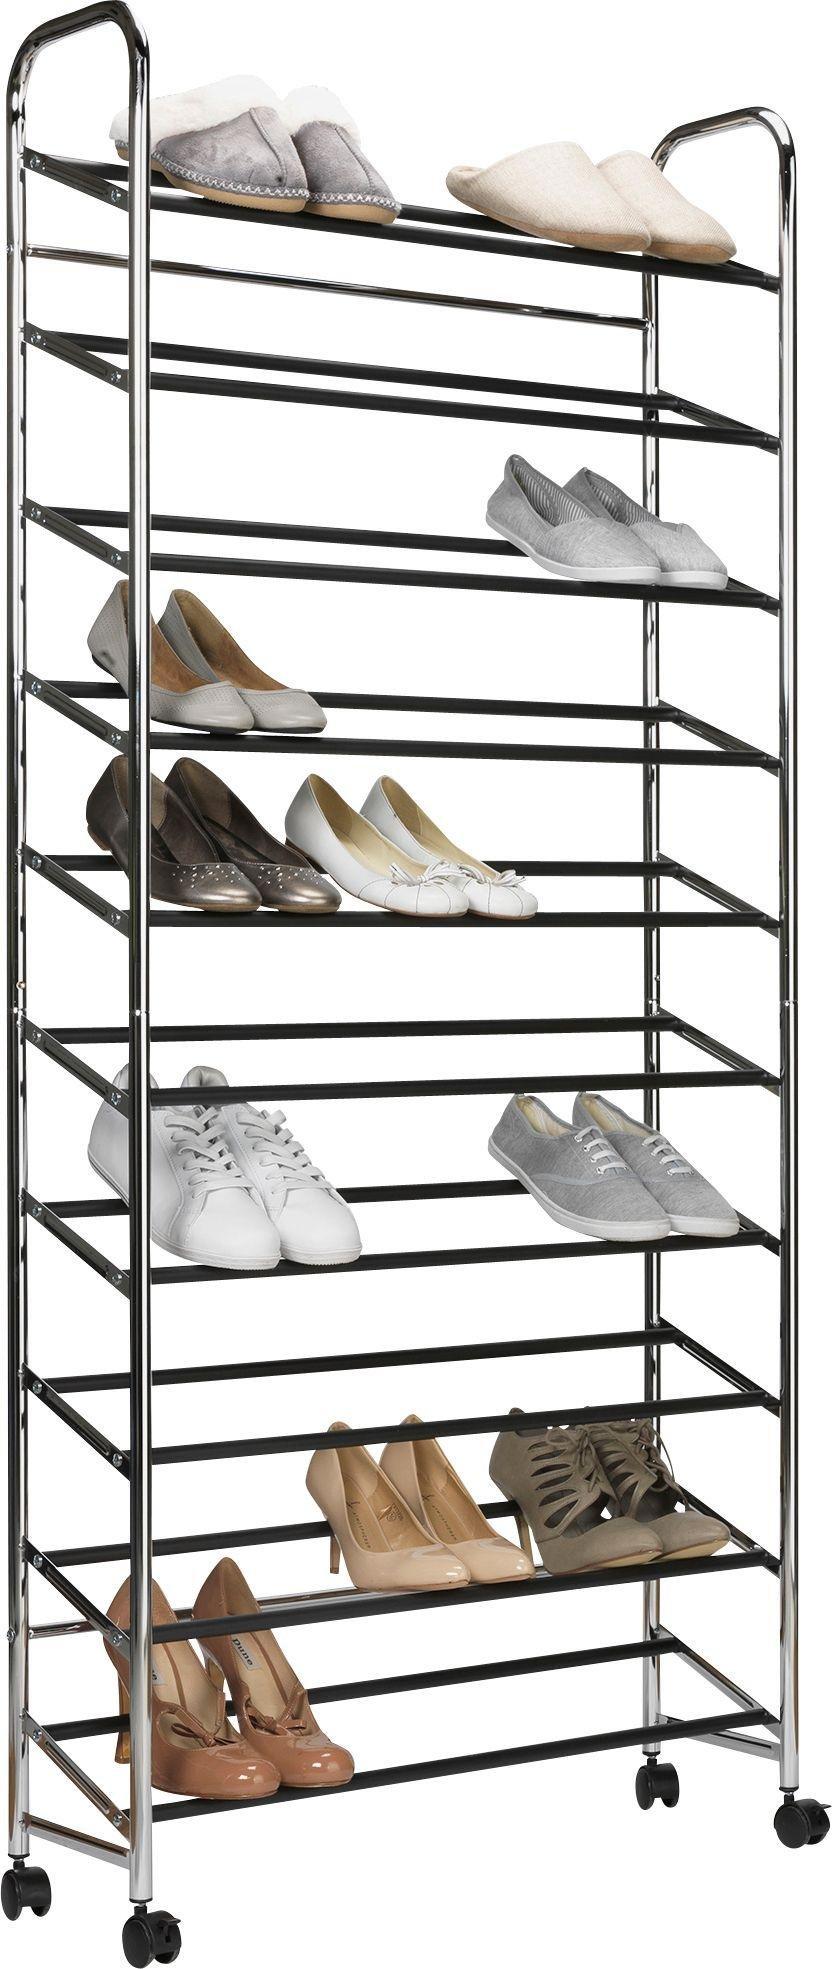 home 10 shelf rolling shoe storage rack chrome